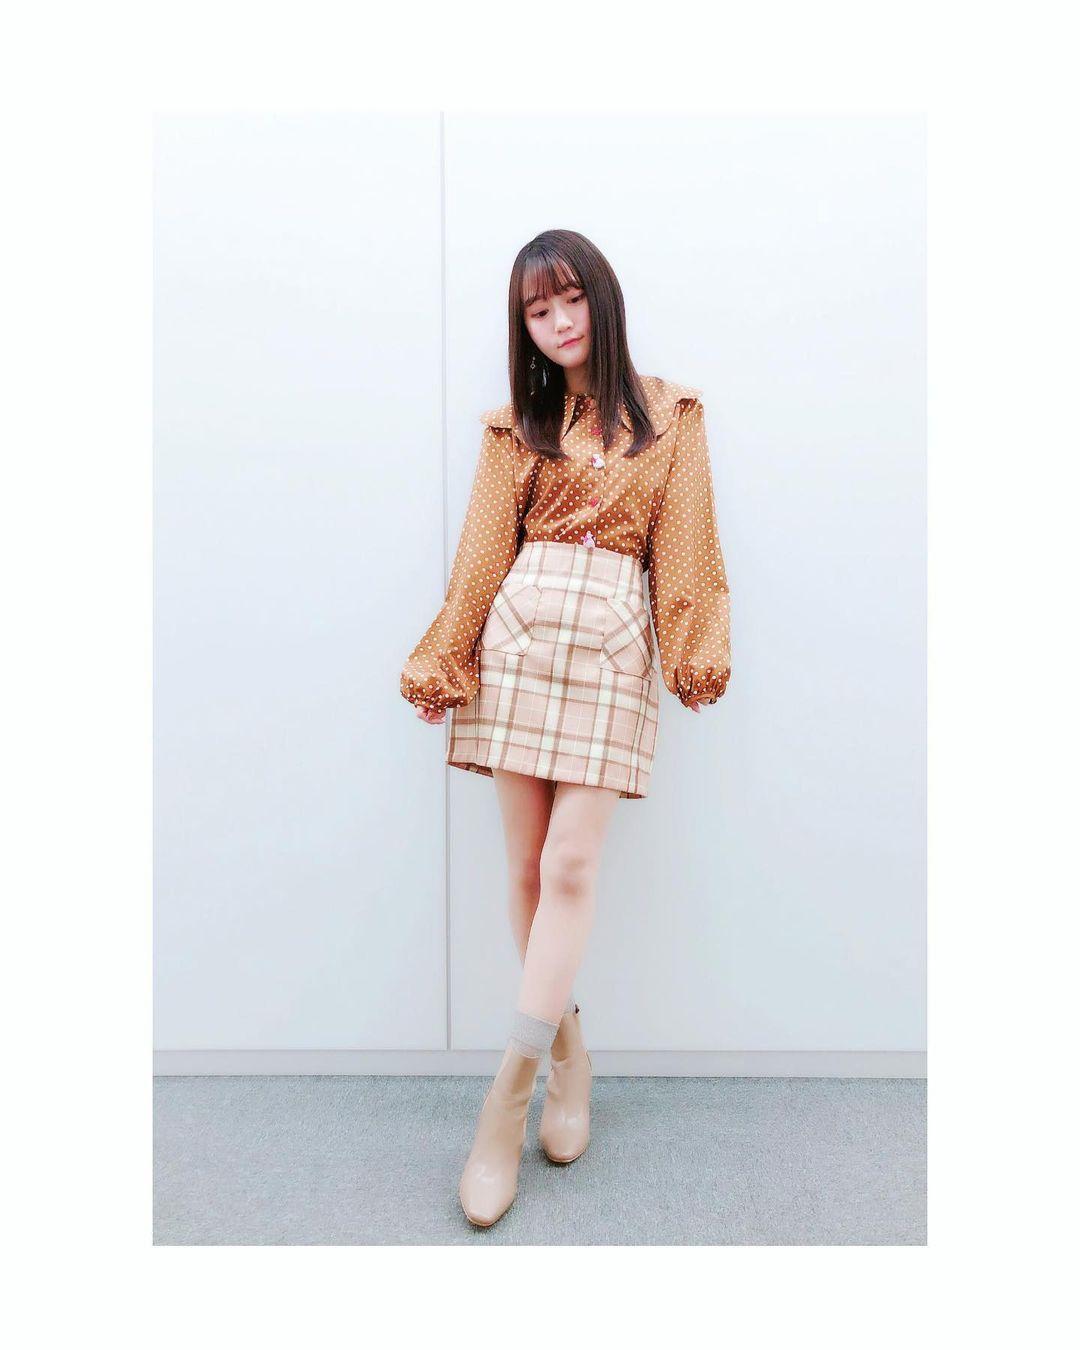 ogura_yui186.jpg